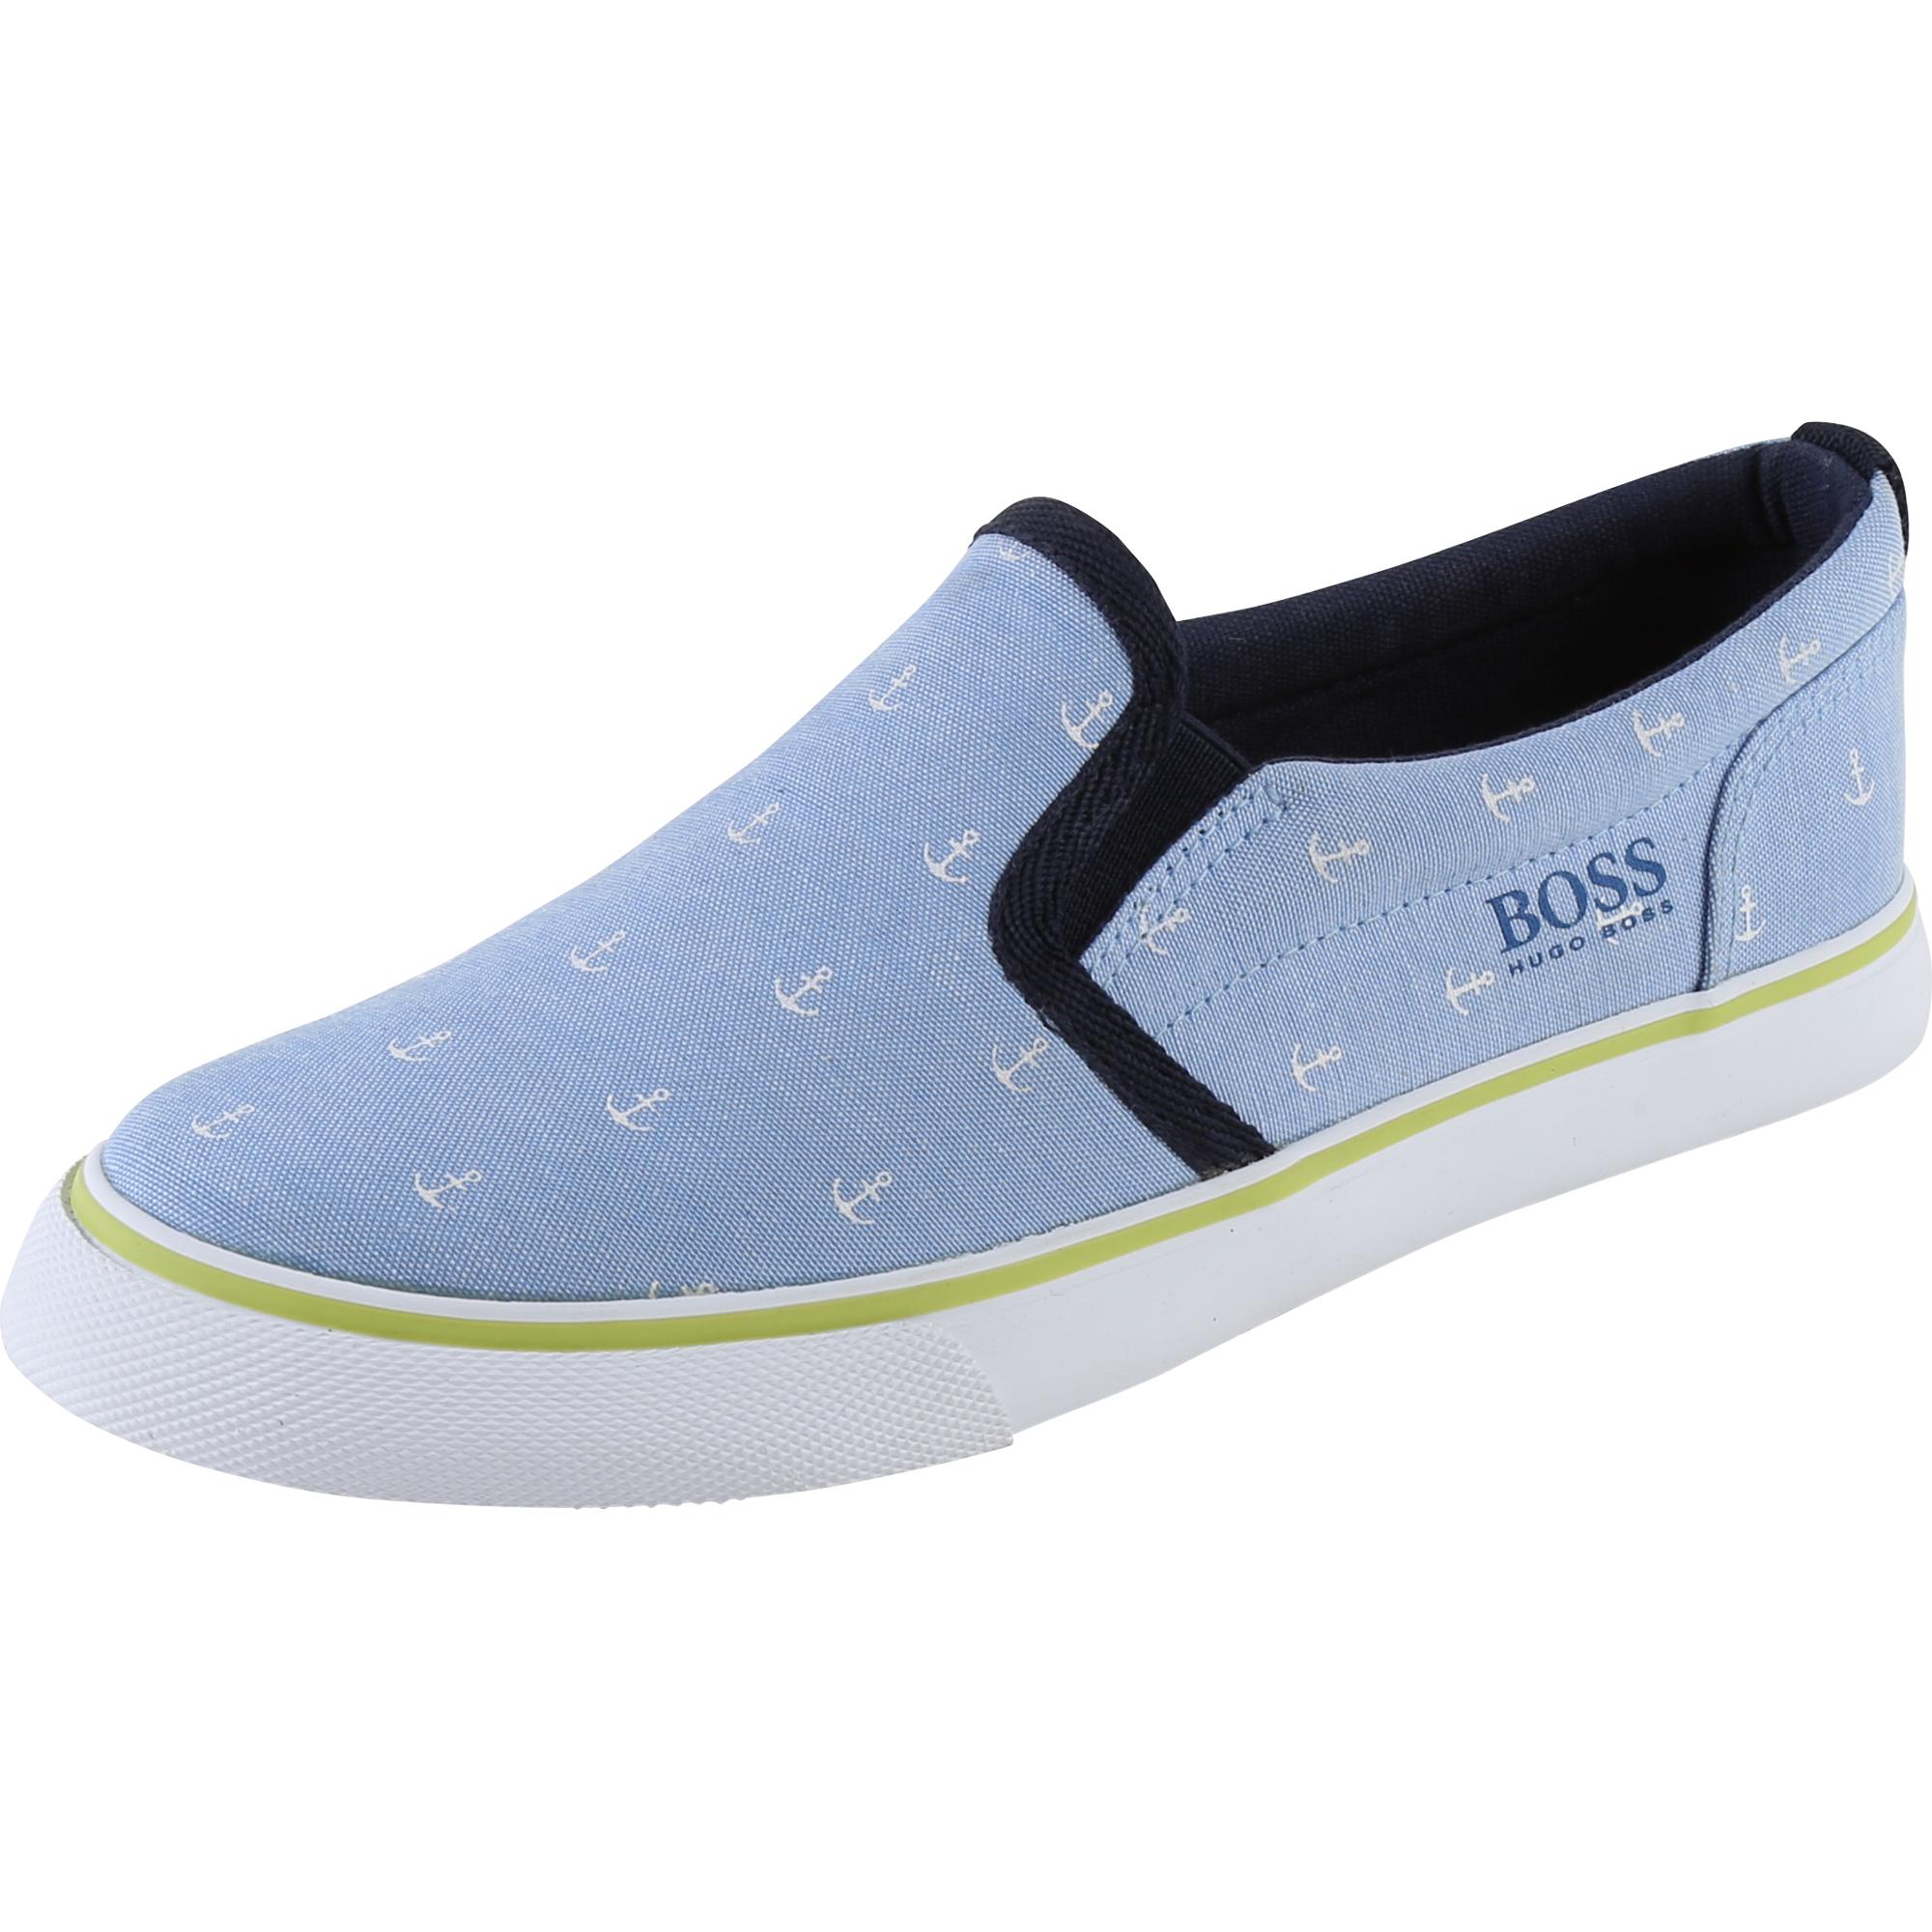 new style cdacc cbb0b Hugo Boss Schuhe